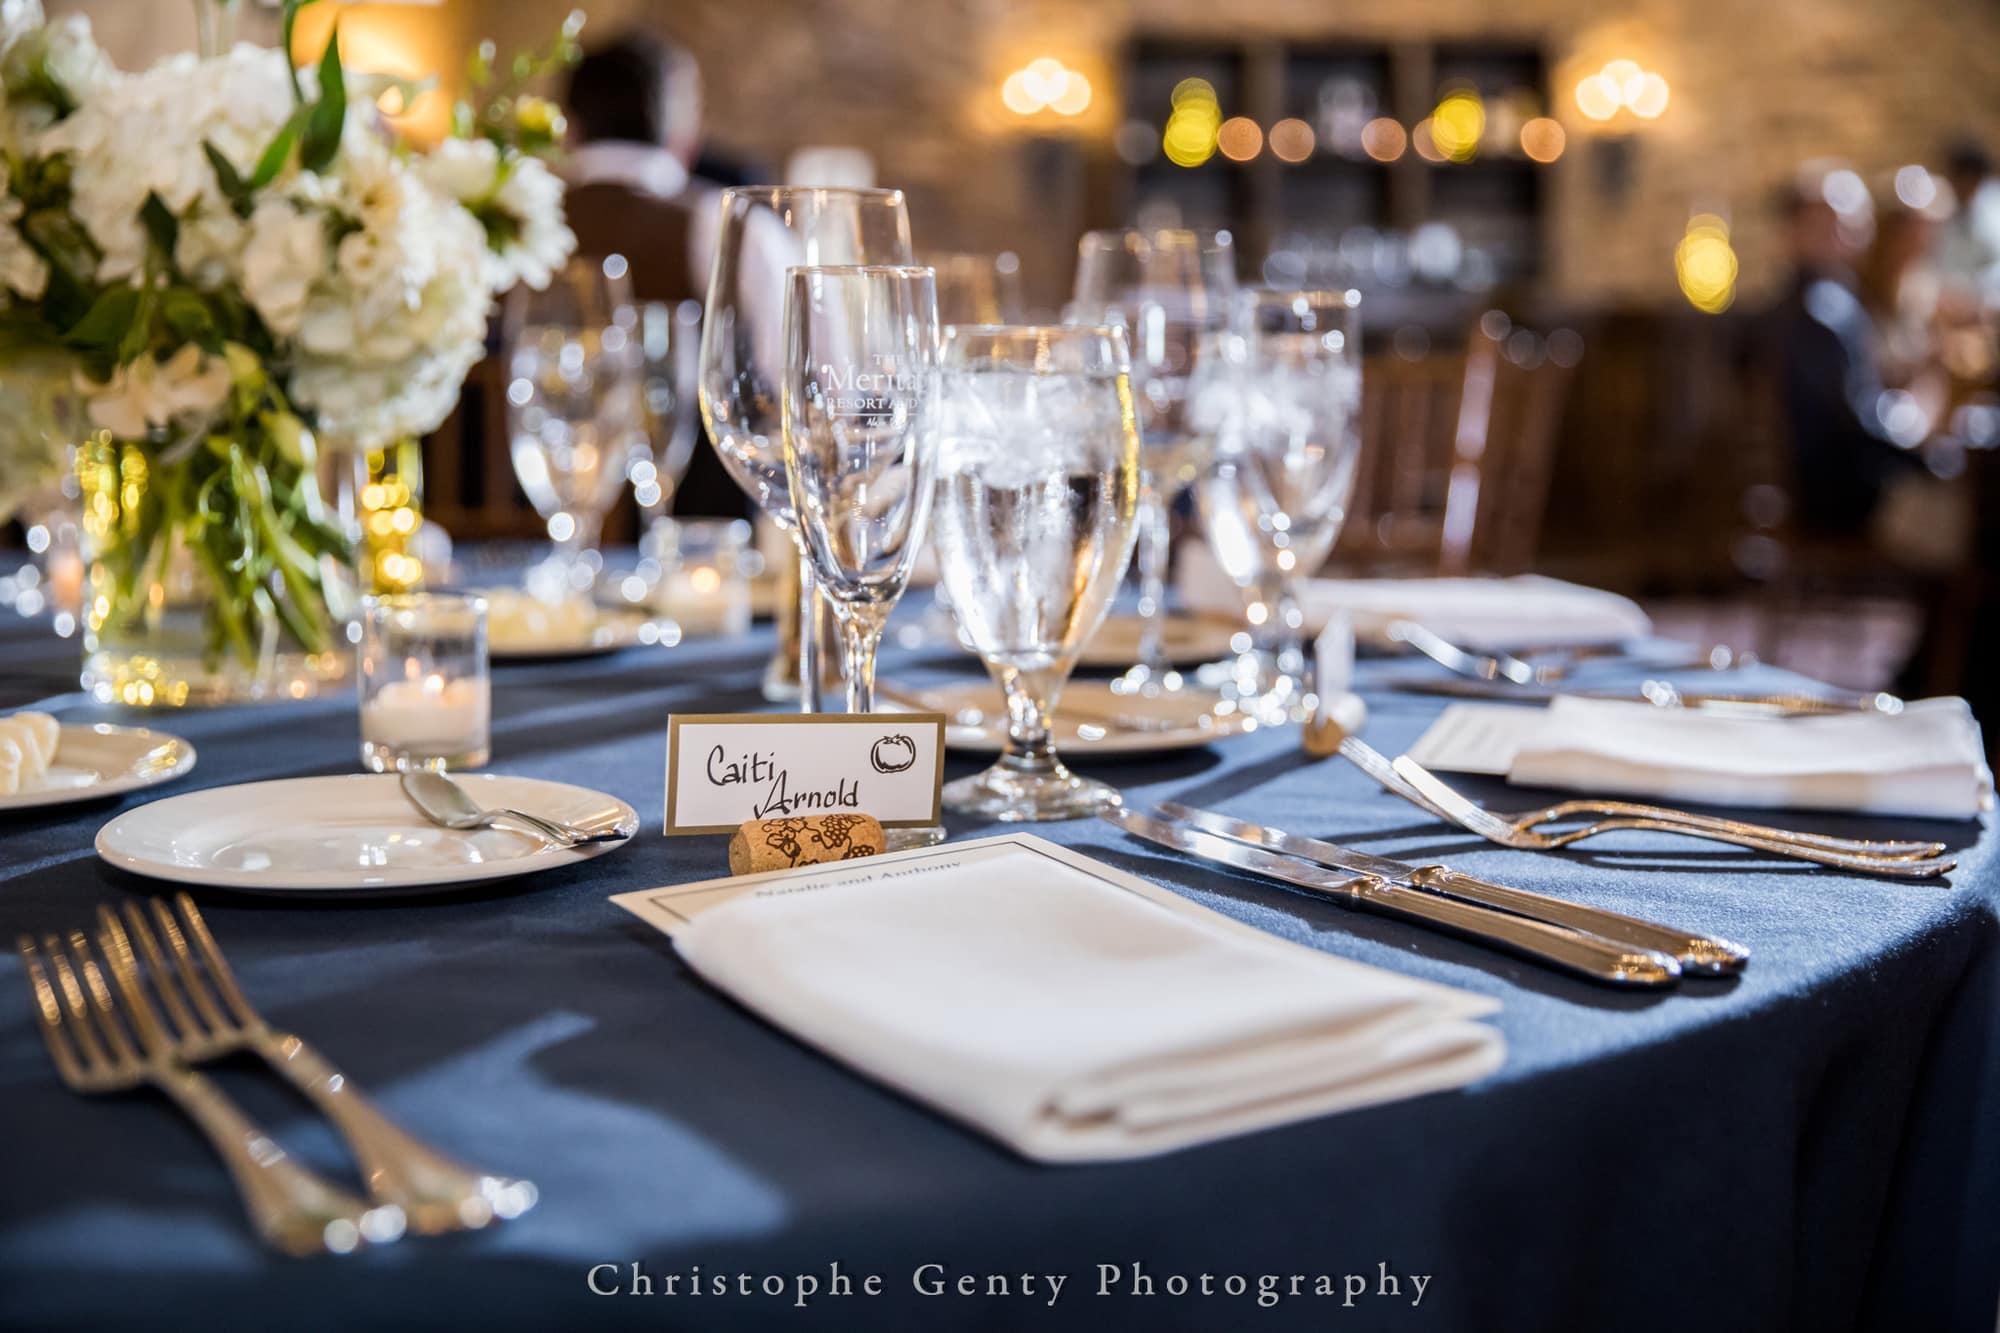 Wedding Photography at The Meritage Inn & Spa, Napa CA